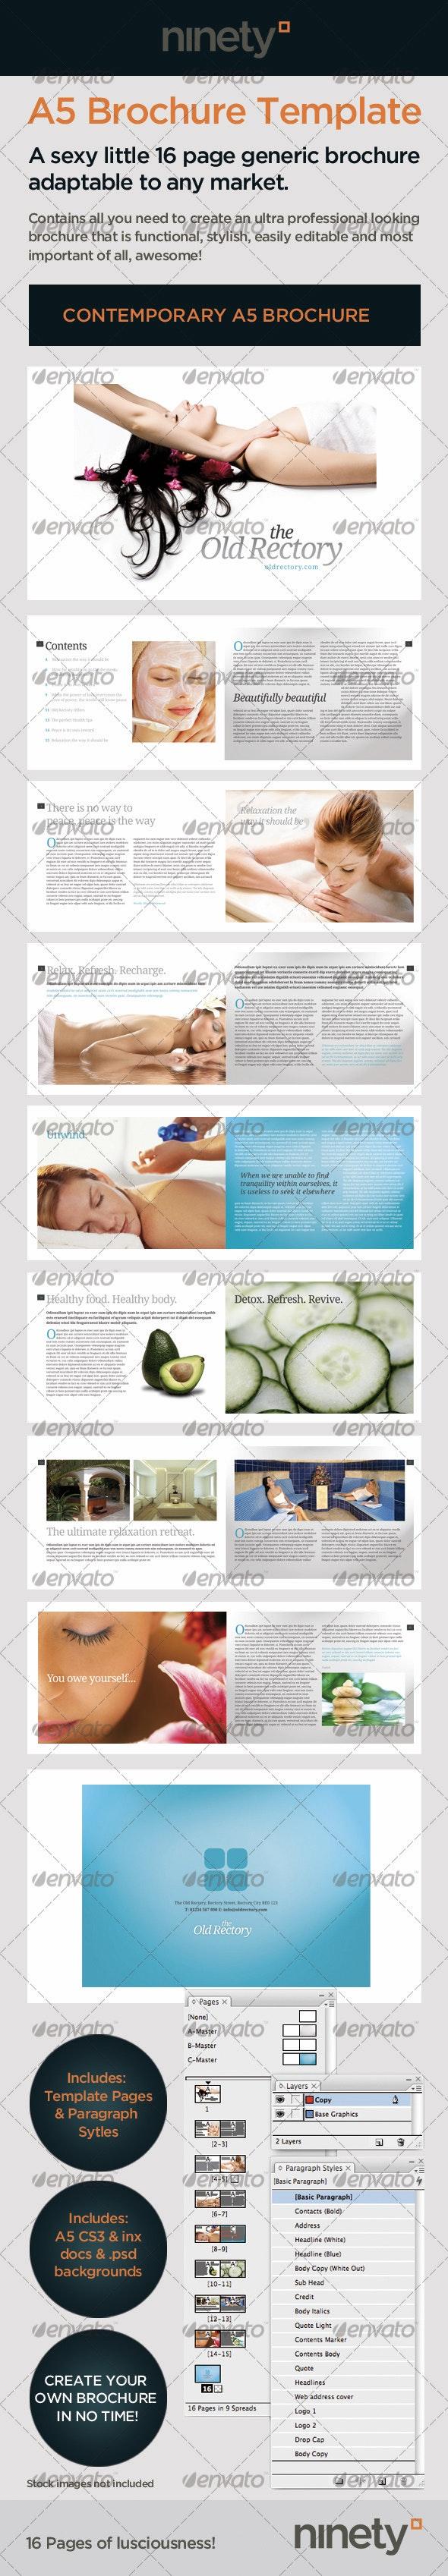 Luscious Generic A5 Brochure - Corporate Brochures